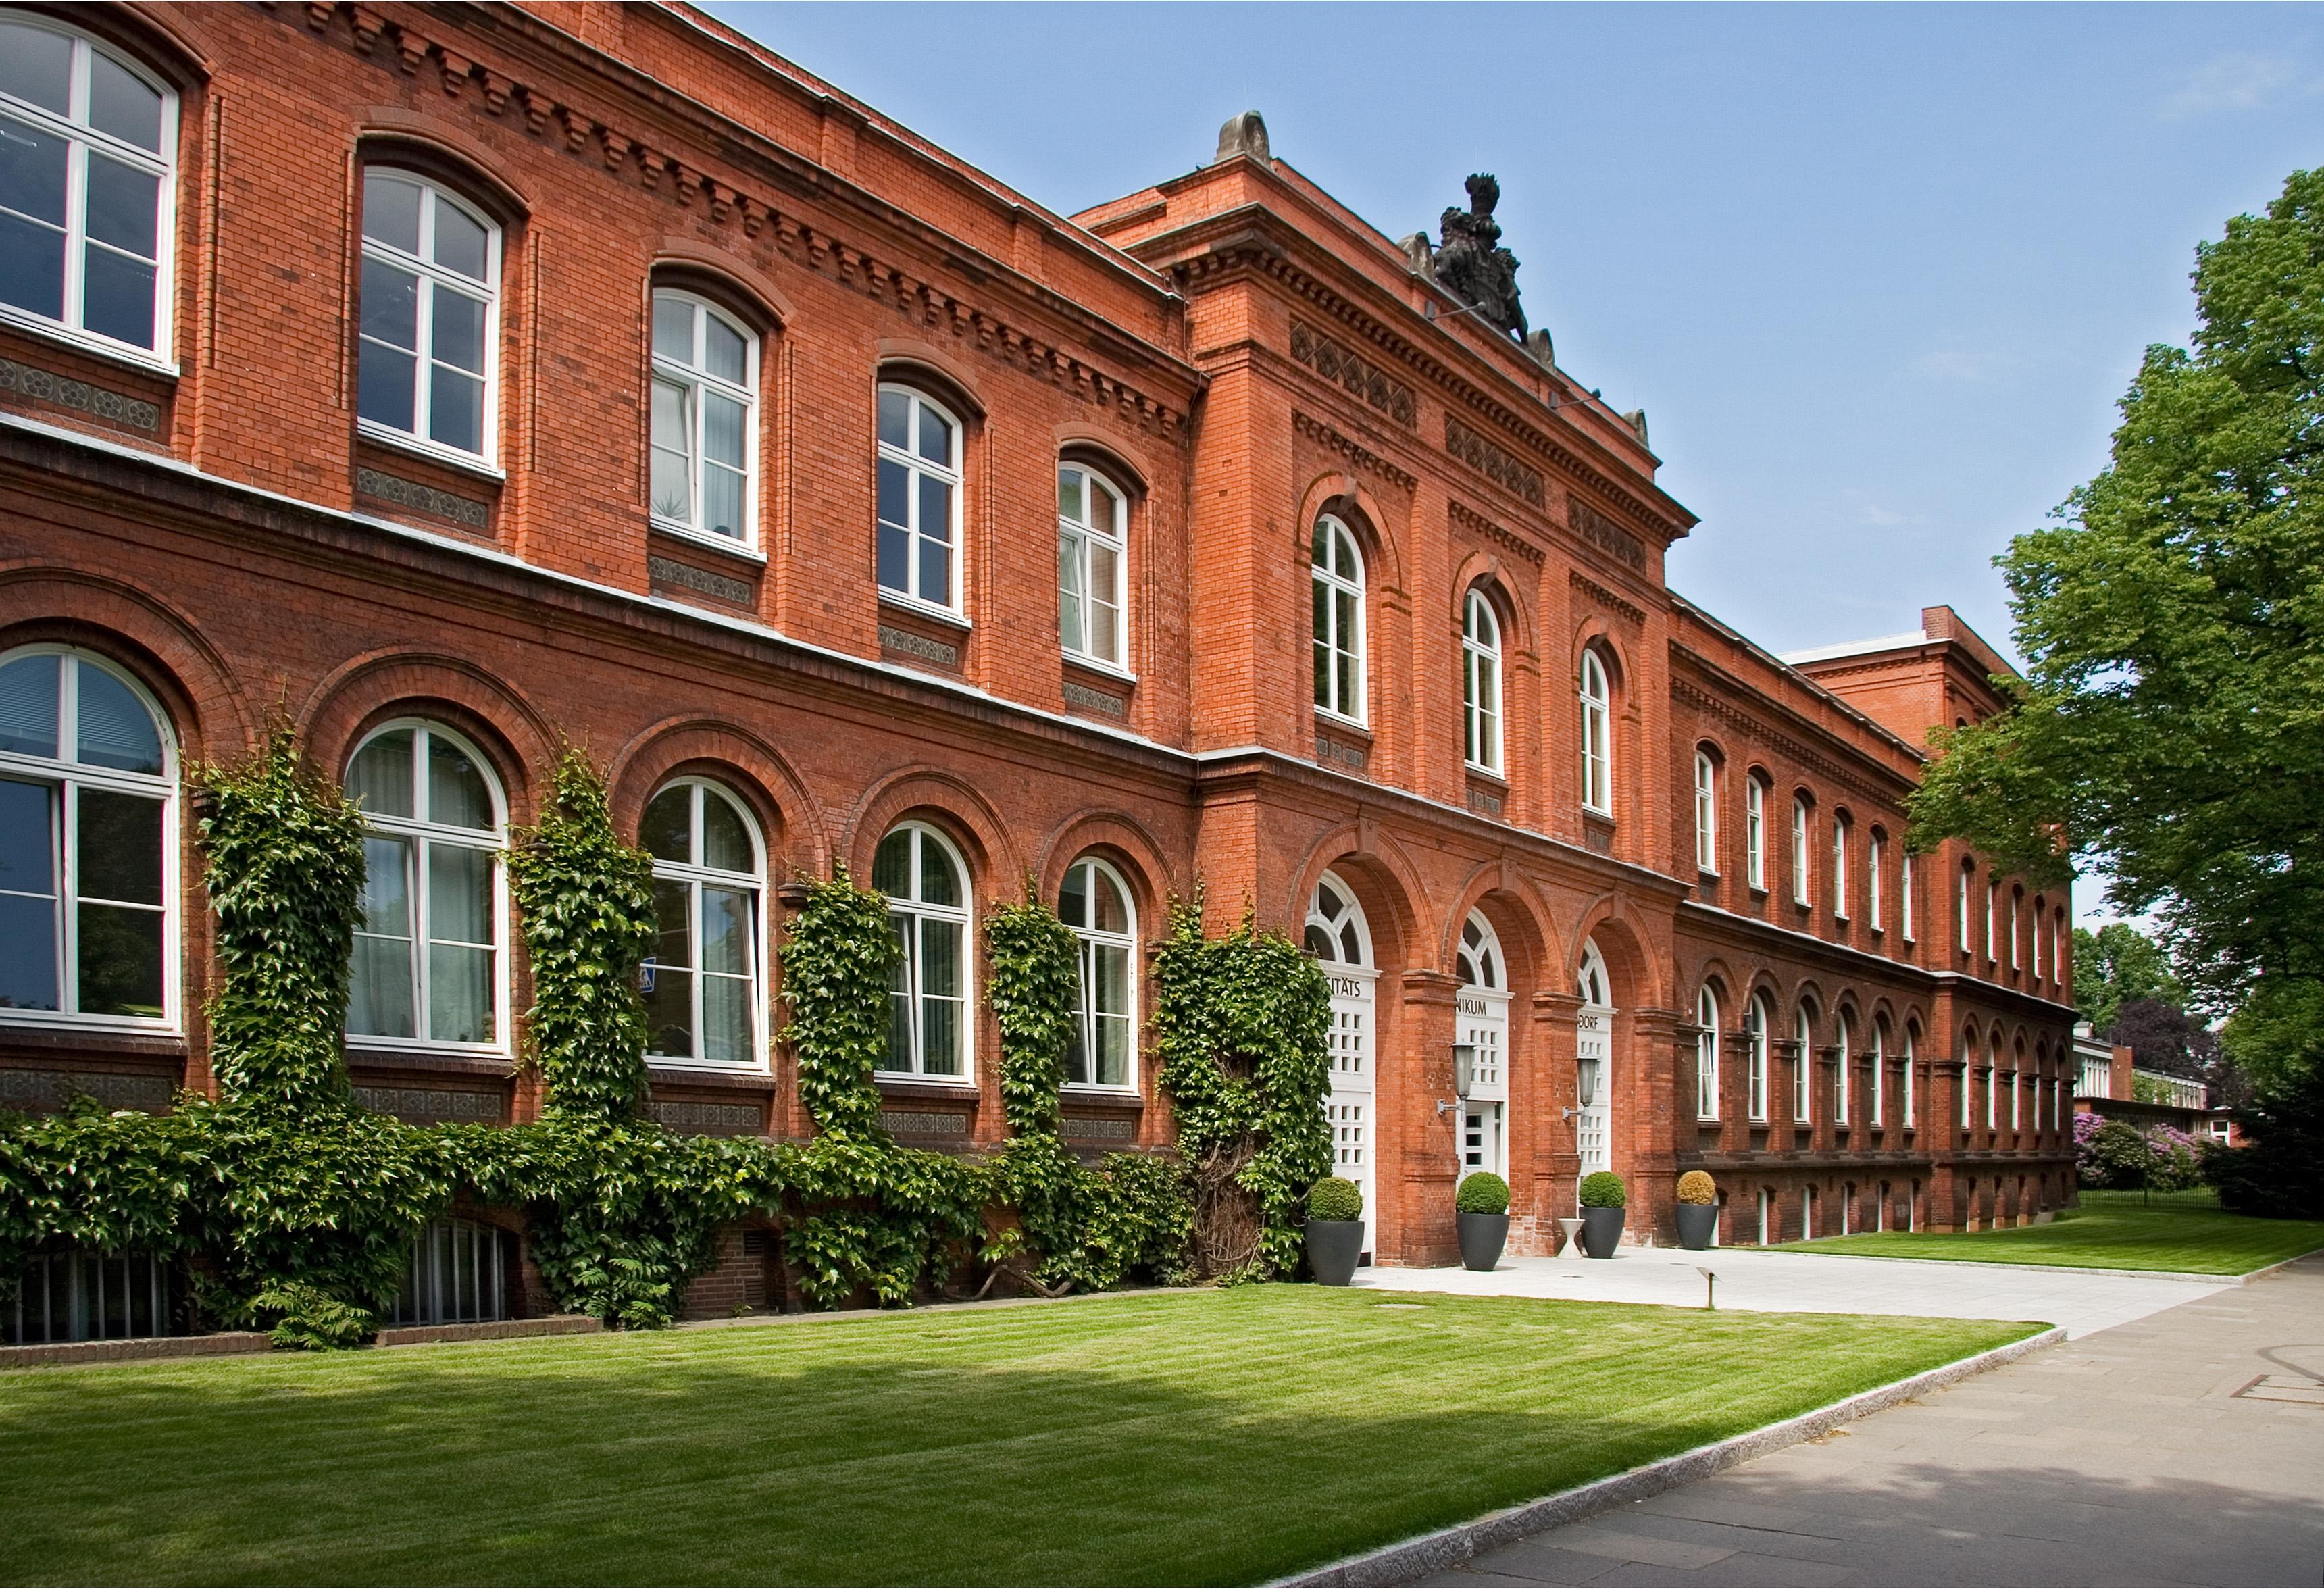 Das Universitätsklinikum Hamburg-Eppendorf